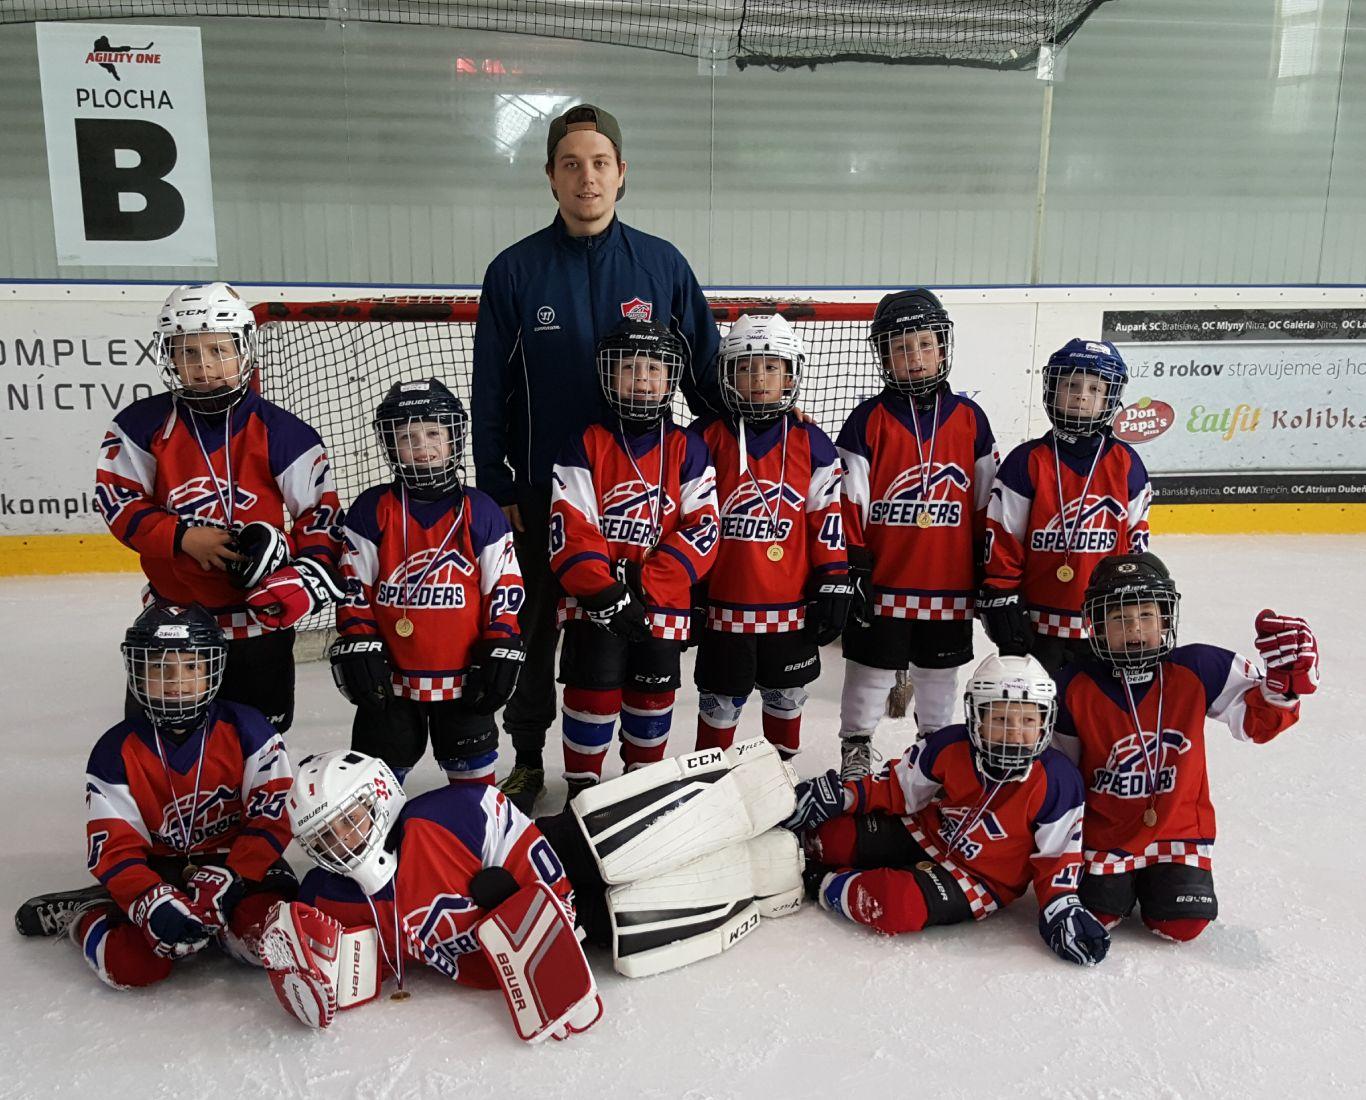 Speeders hokej AgilityOneCup team